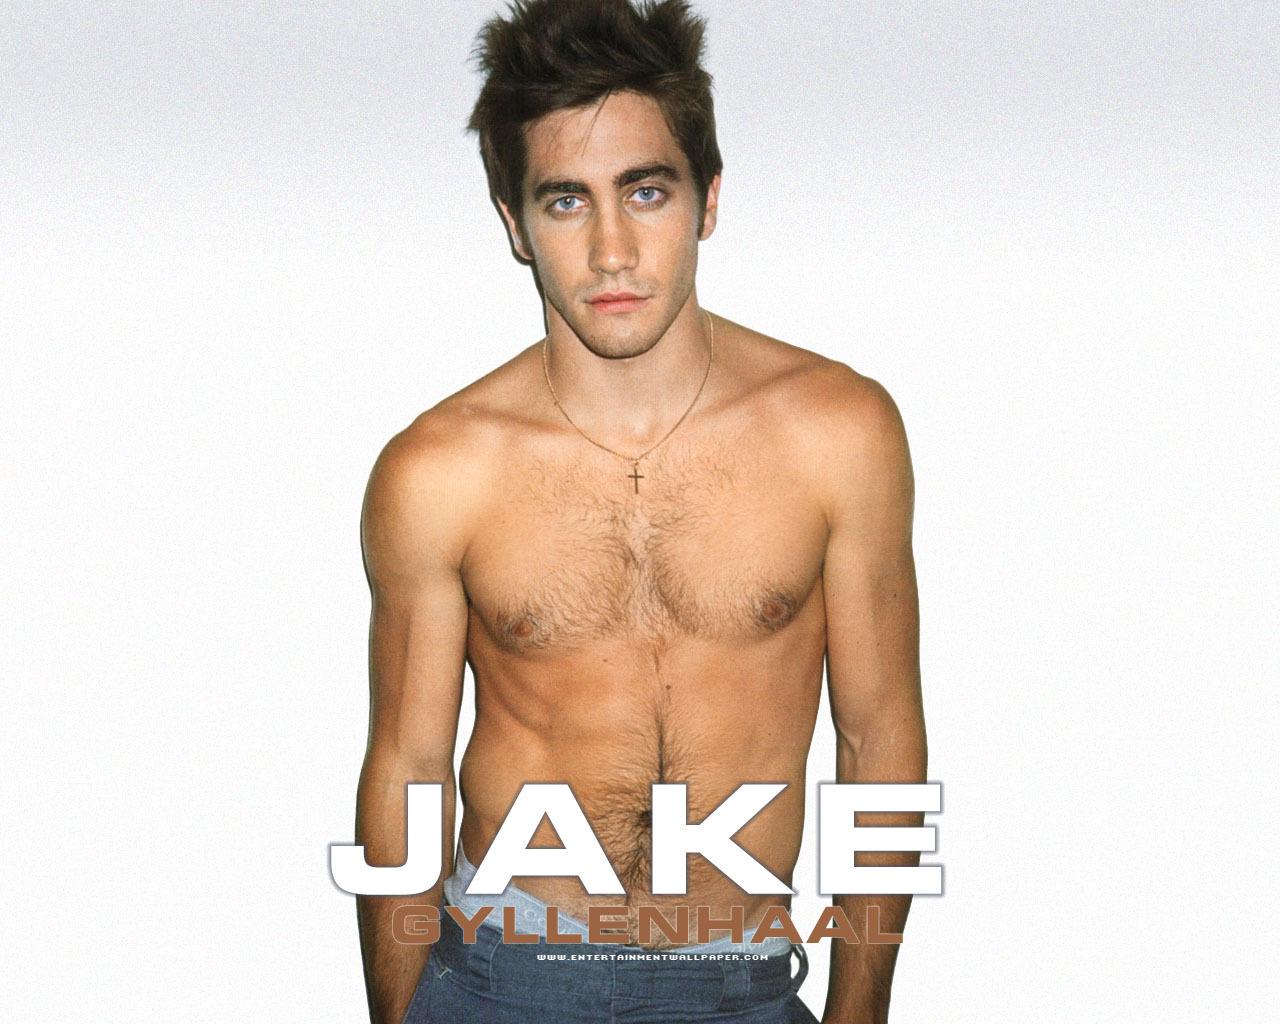 http://1.bp.blogspot.com/-45eE52c41-o/TagV-M-omaI/AAAAAAAAAFo/dbXD1jgVXxE/s1600/Jake-Gyllenhaal-hottest-actors-2966163-1280-1024.jpg